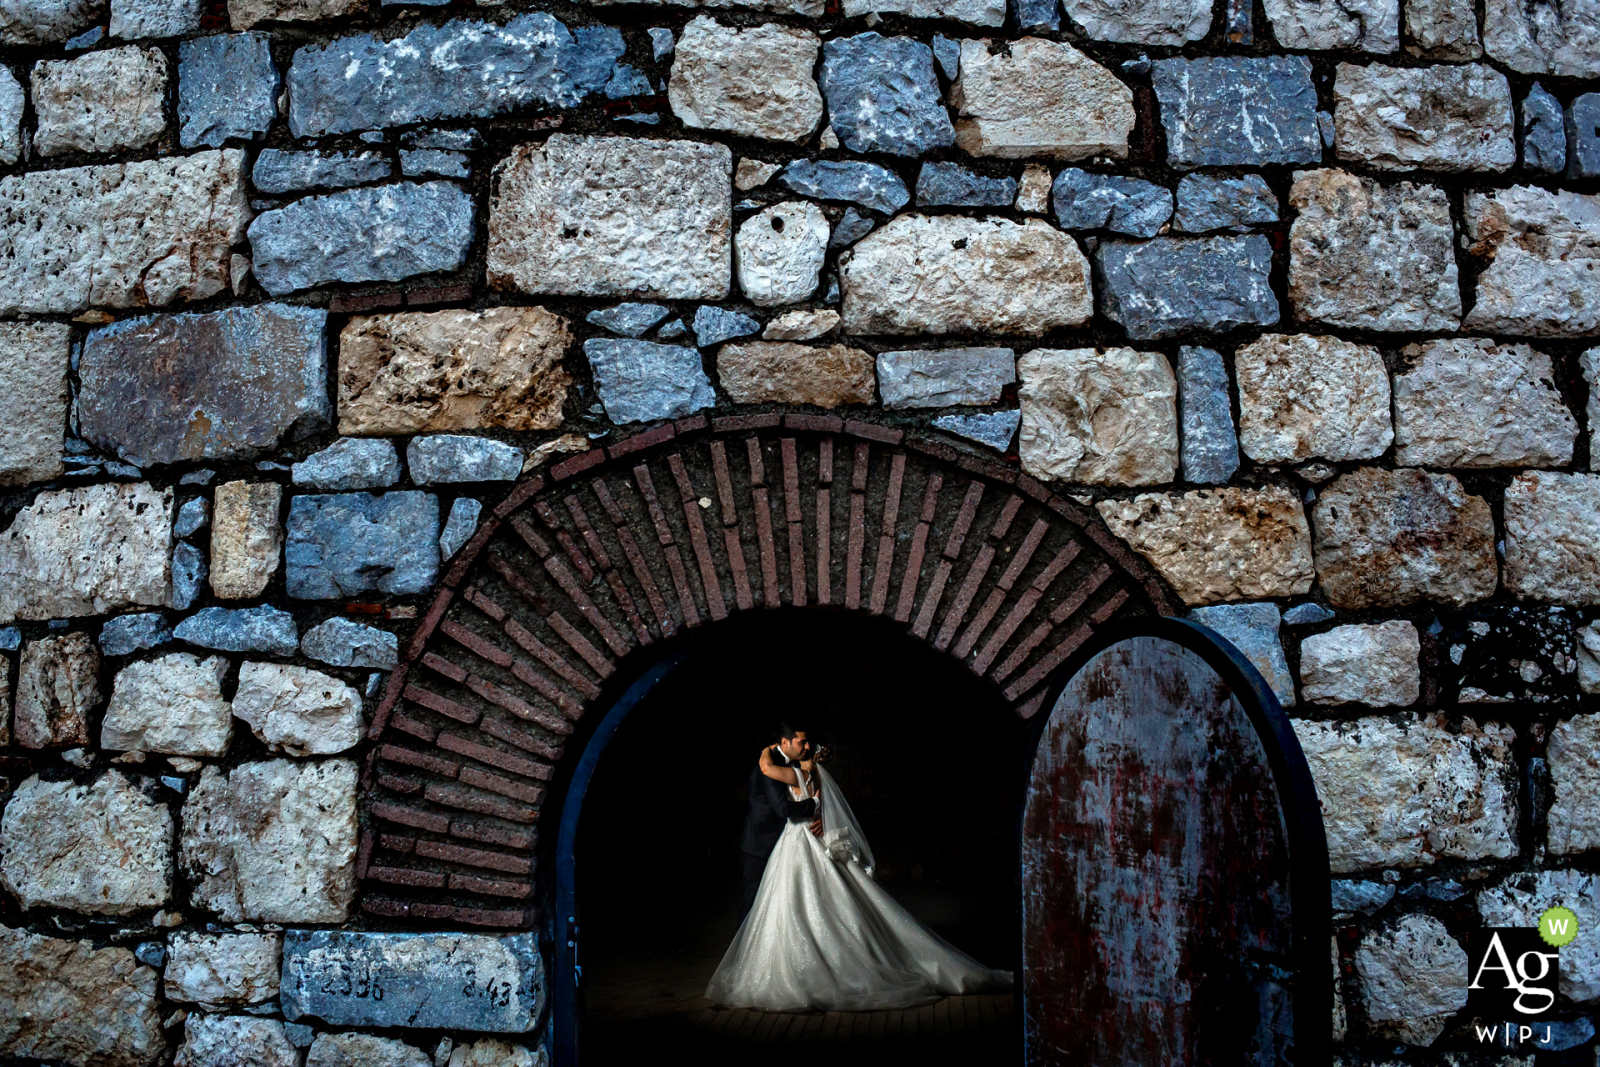 Izmir Karsiyaka Nikah Salonu, Turkey bride and groom posing during a portrait session in a brick arch under a stone wall